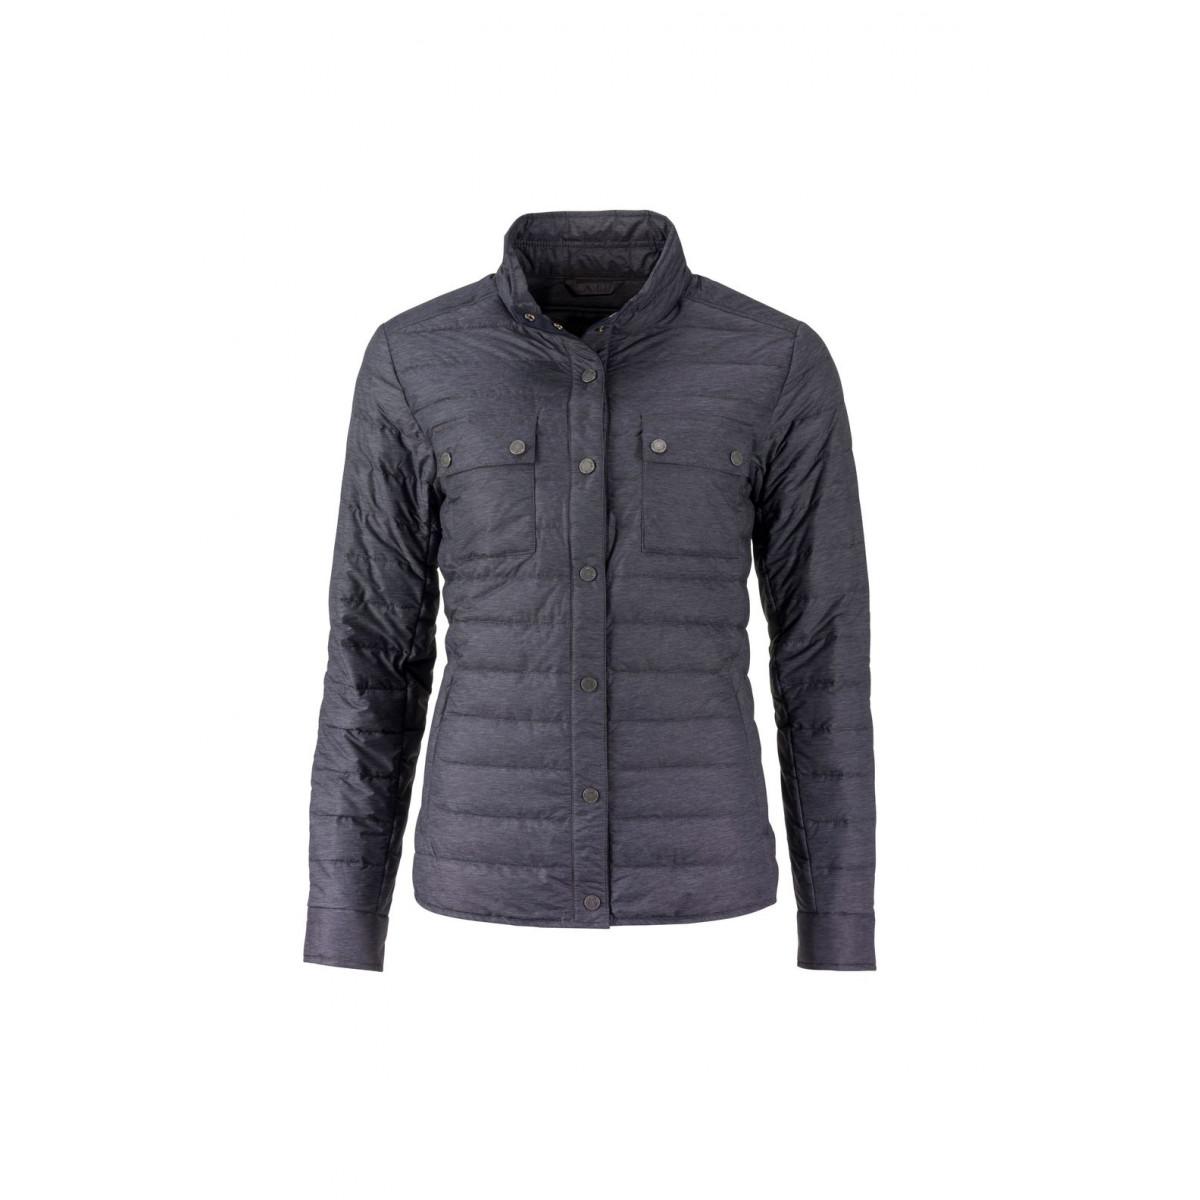 Куртка женская JN1105 Ladies Lightweight Down Jacket - Черный меланж